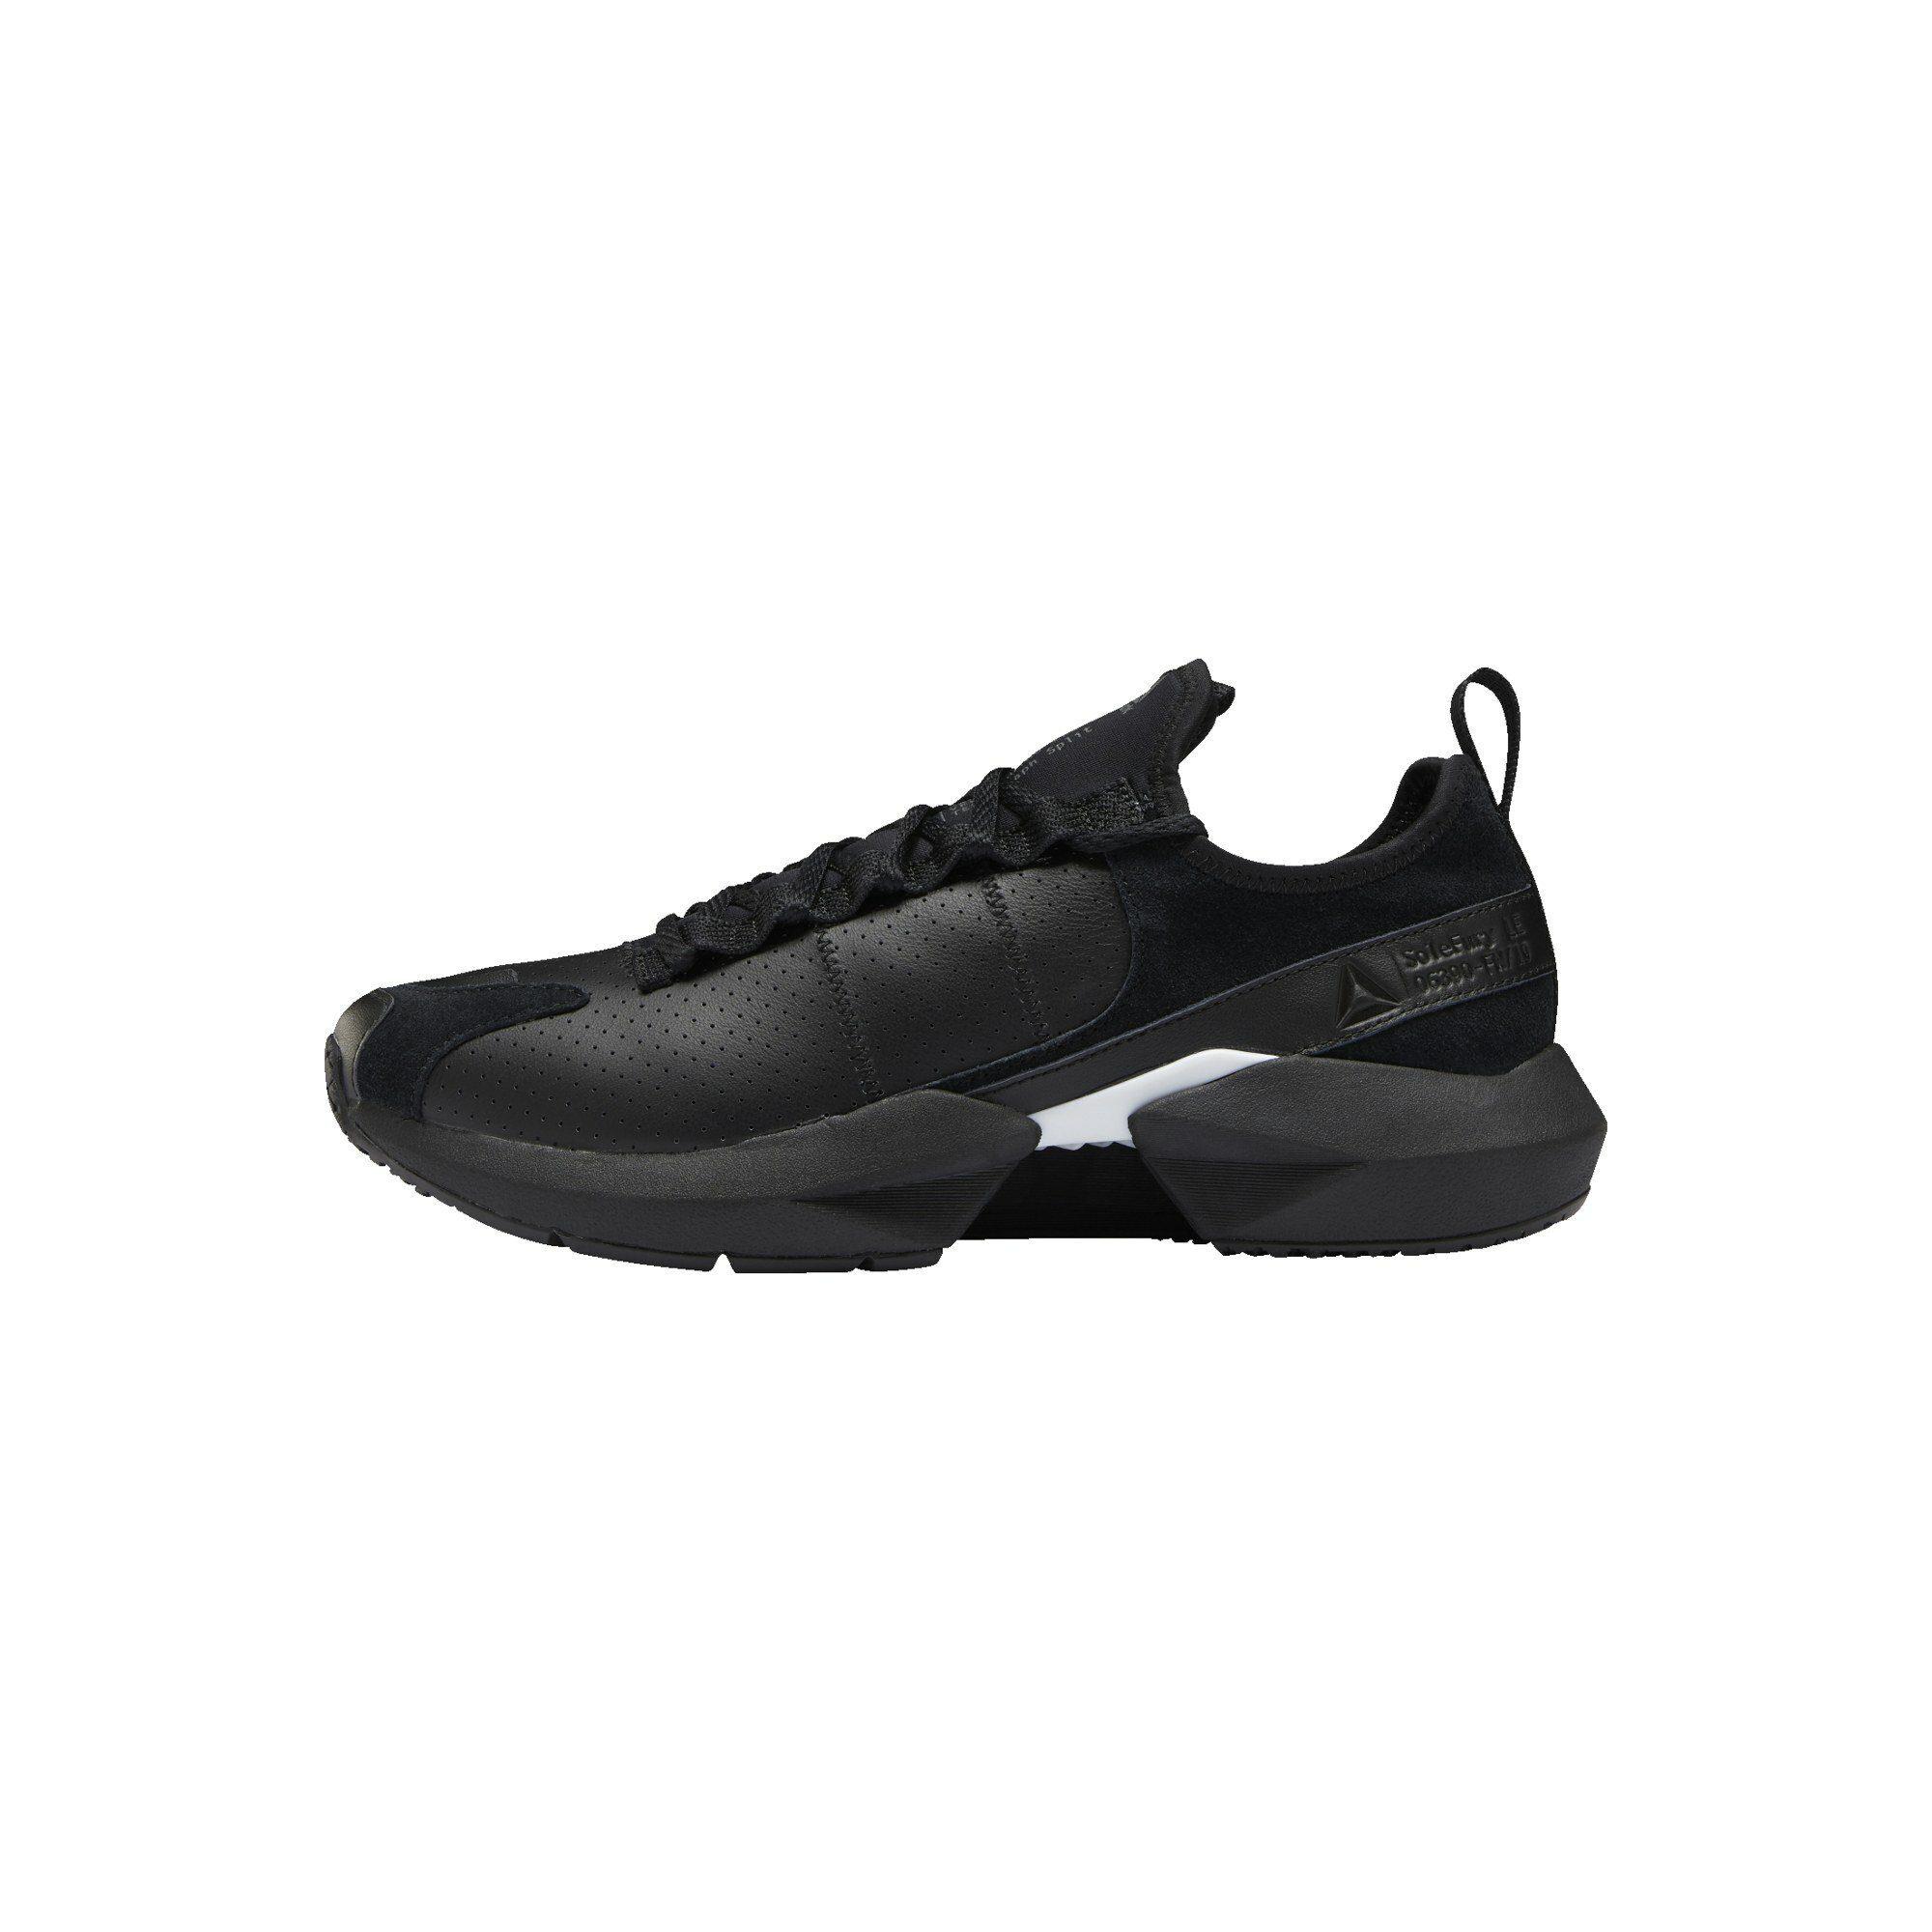 Reebok »Sole Fury LE Shoes« Trainingsschuh kaufen | OTTO